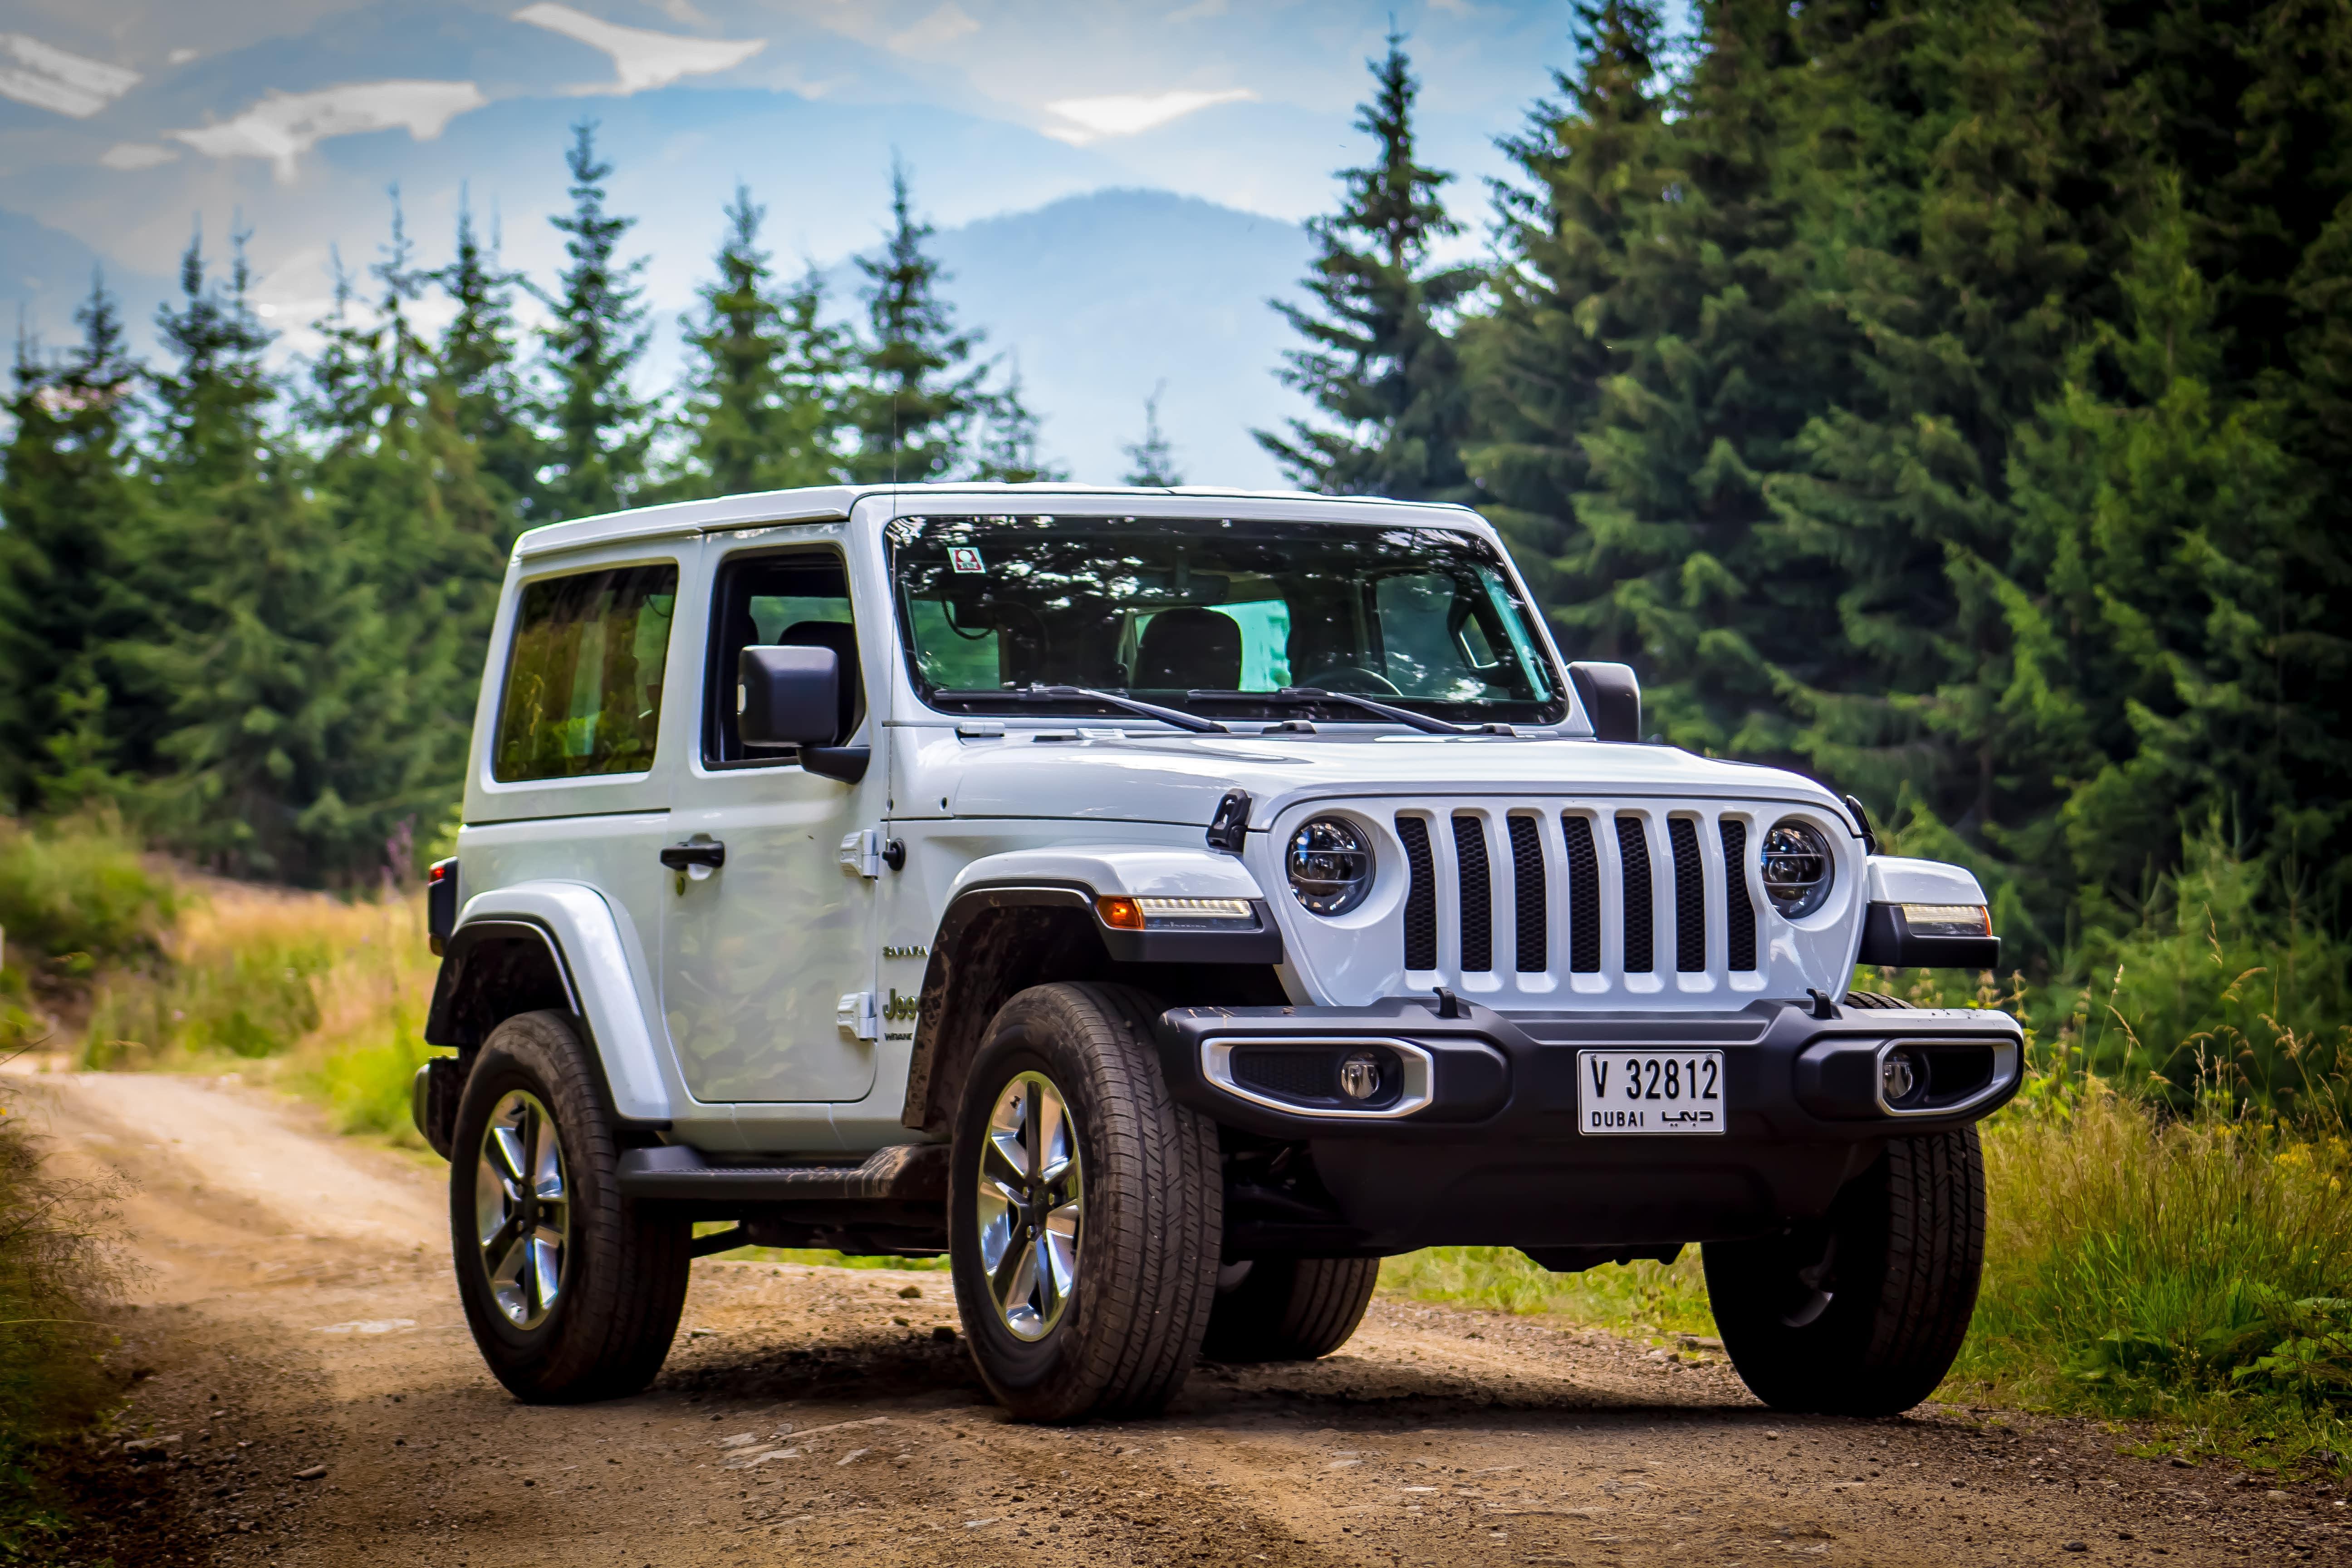 10 Best Jeep Wrangler Mods